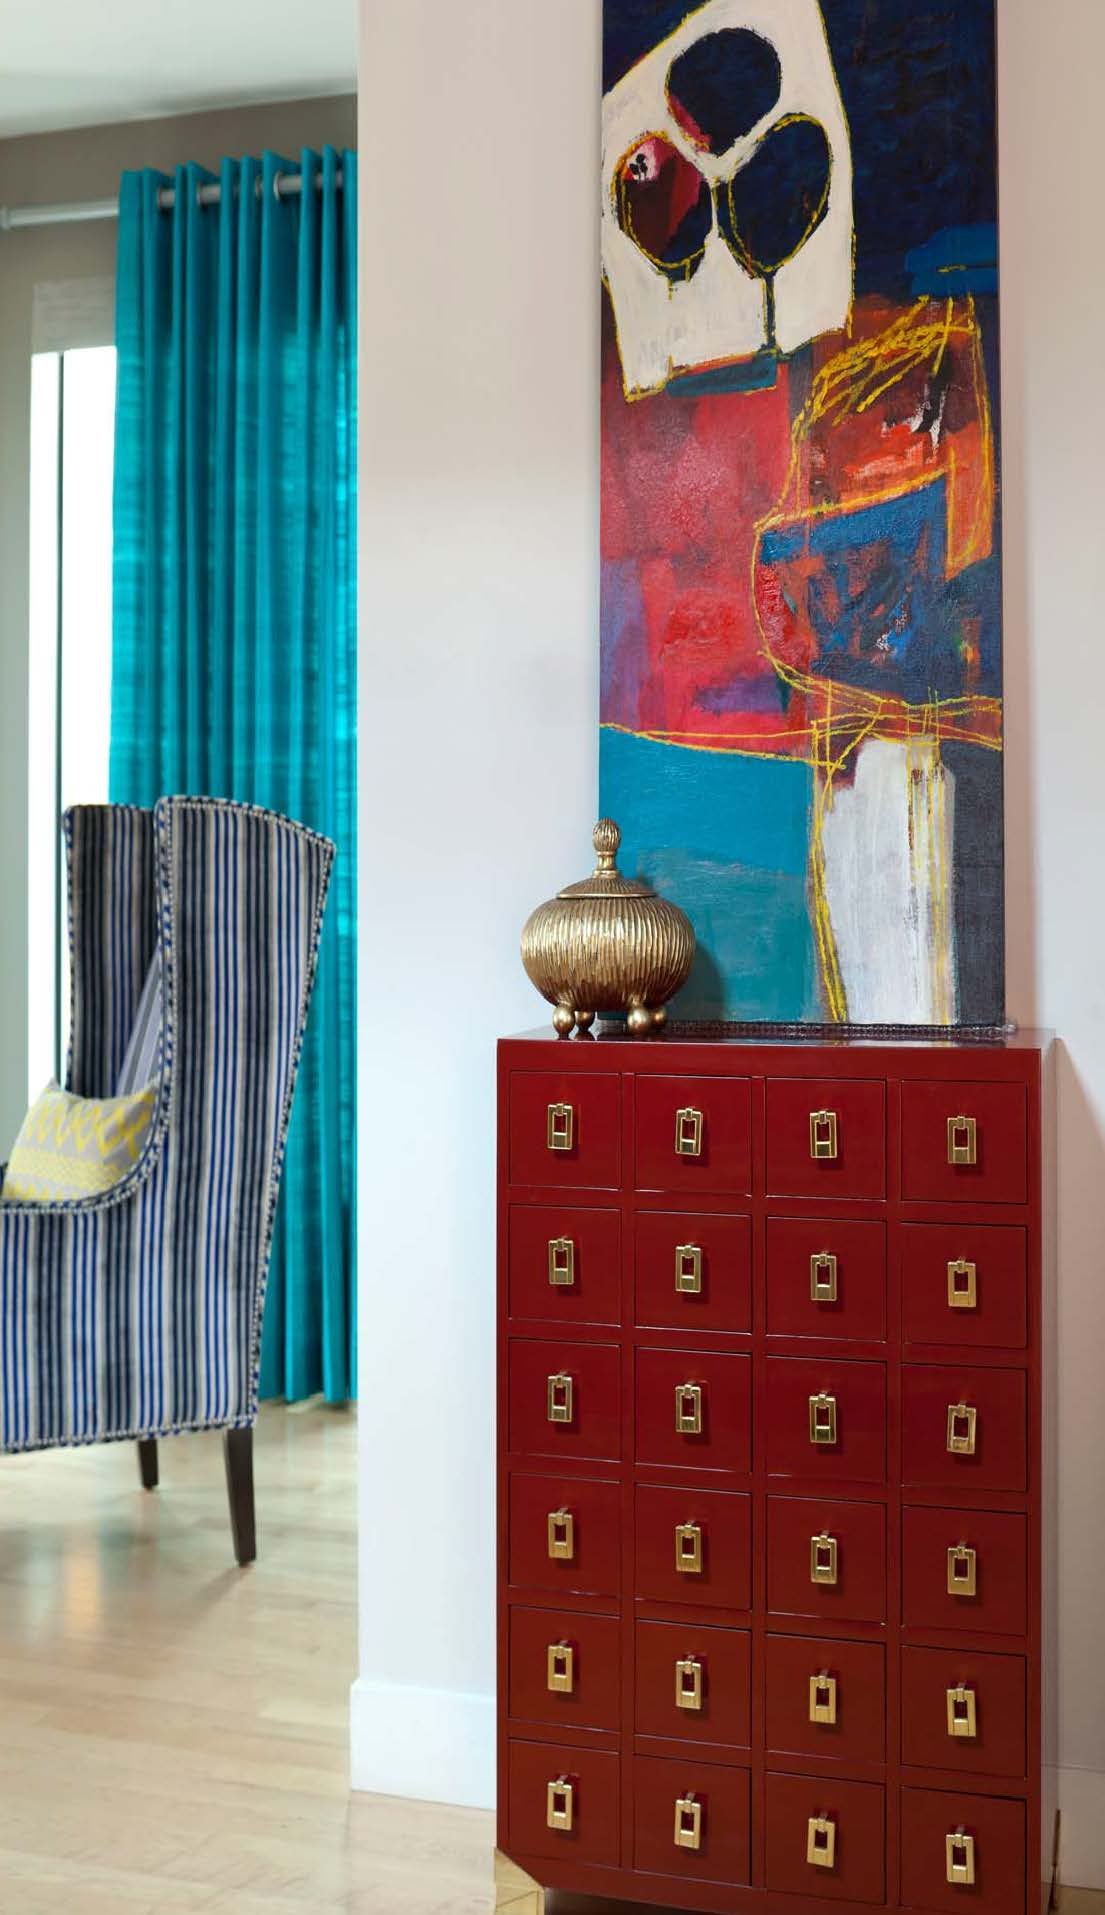 Private Residence. Luxe Magazine. Design: Atelier Interior Design. Emily Minton Redfield Photography. Artist: Ben Strawn.